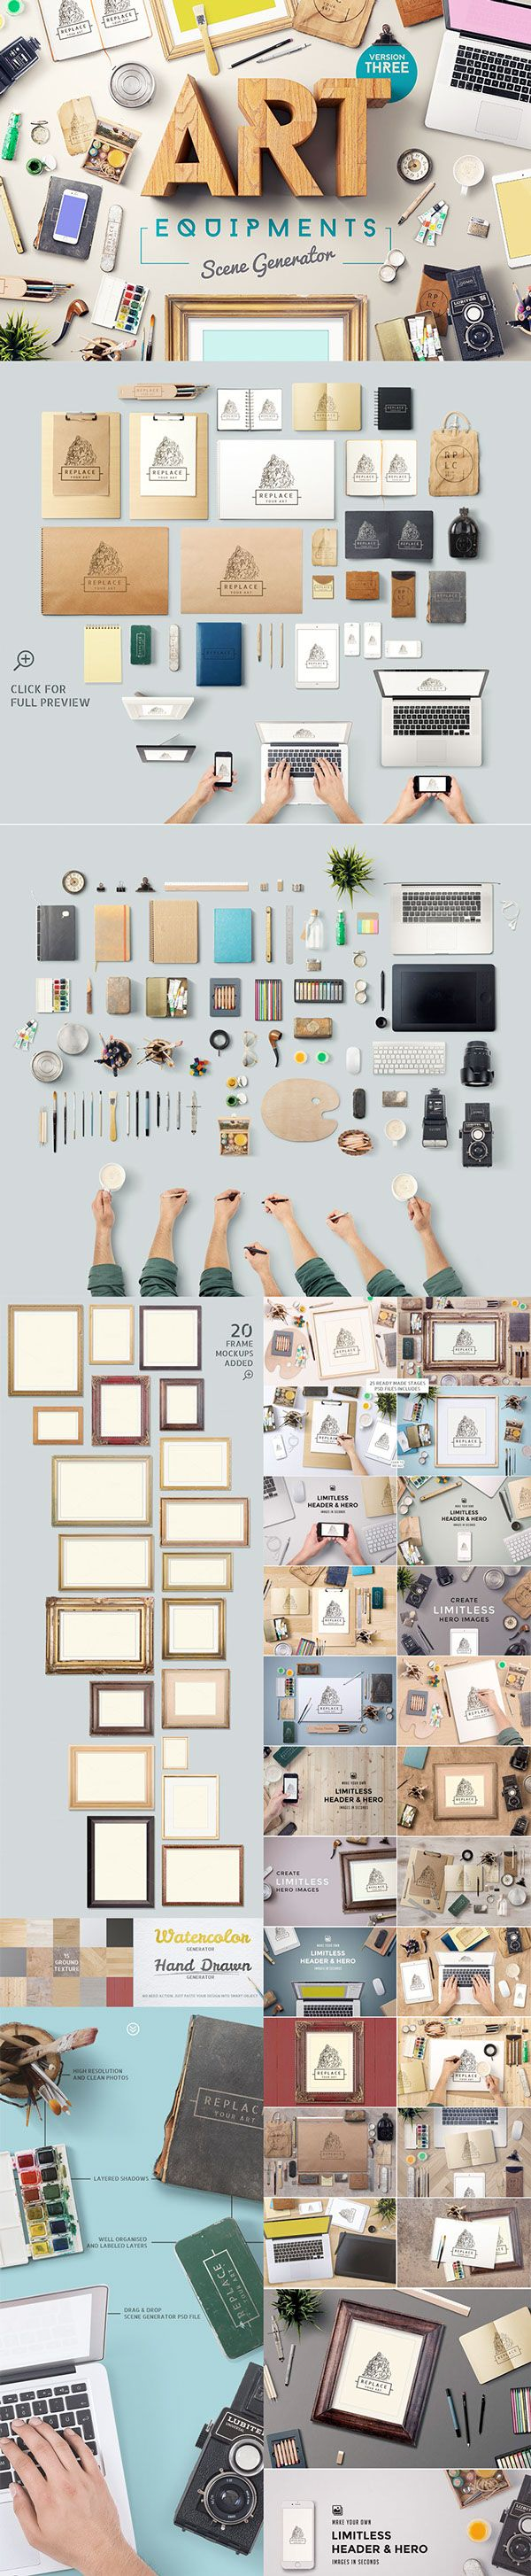 The Gorgeous, Artistic Design Bundle on Behance